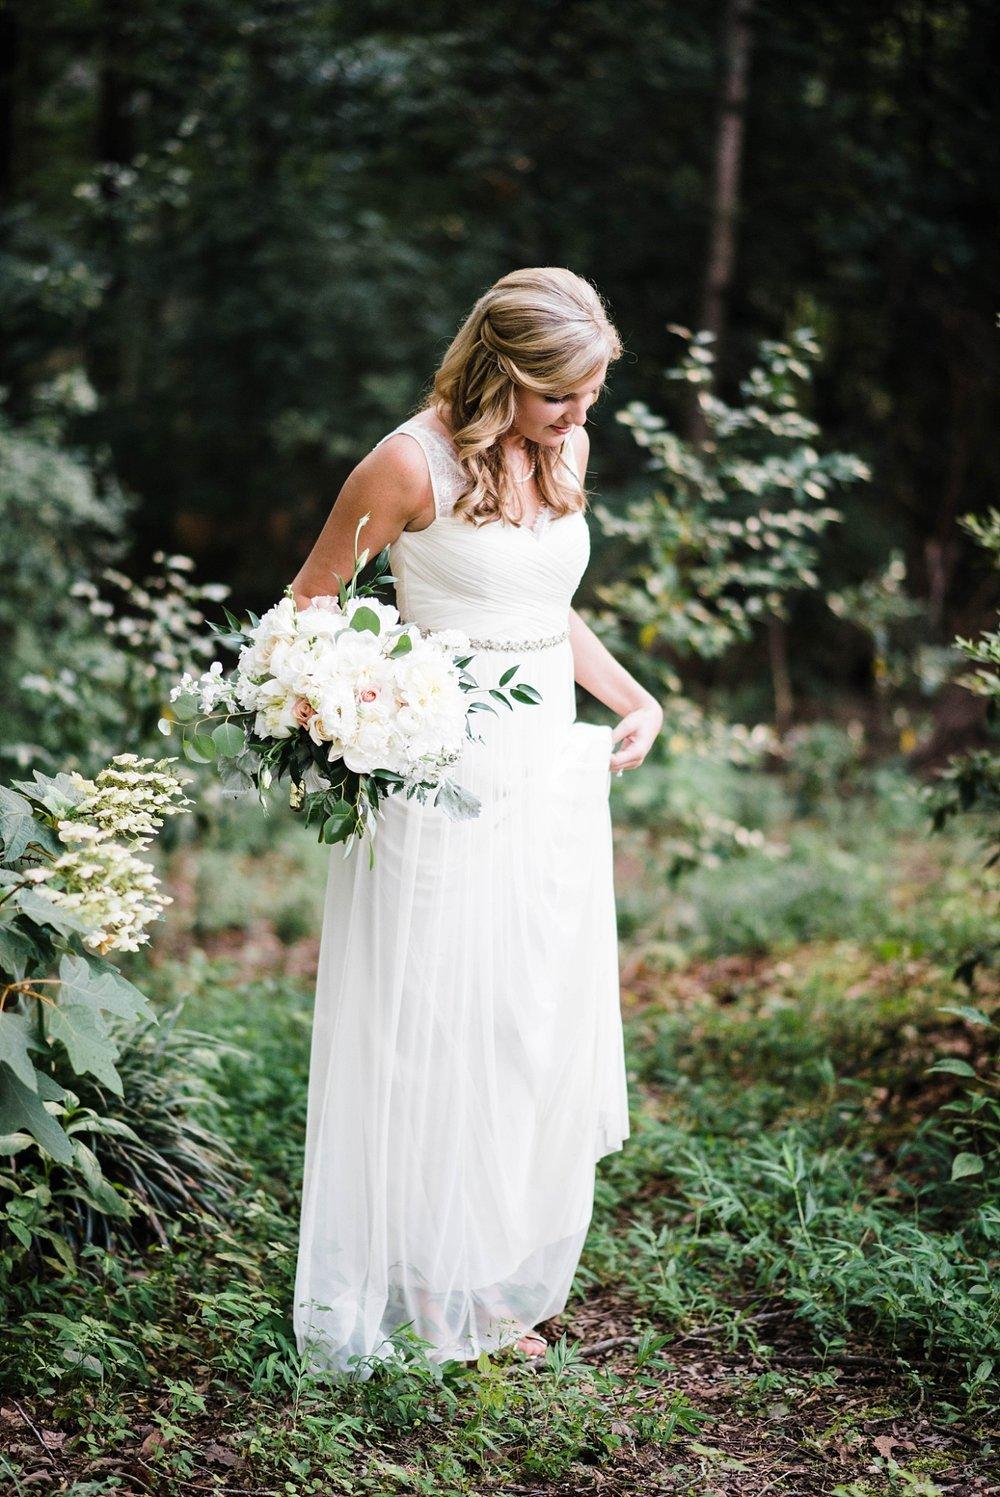 AN INTIMATE BACKYARD BIRMINGHAM WEDDING | NATE & MEGAN BUSH | LAURA WILKERSON PHOTOGRAPHY